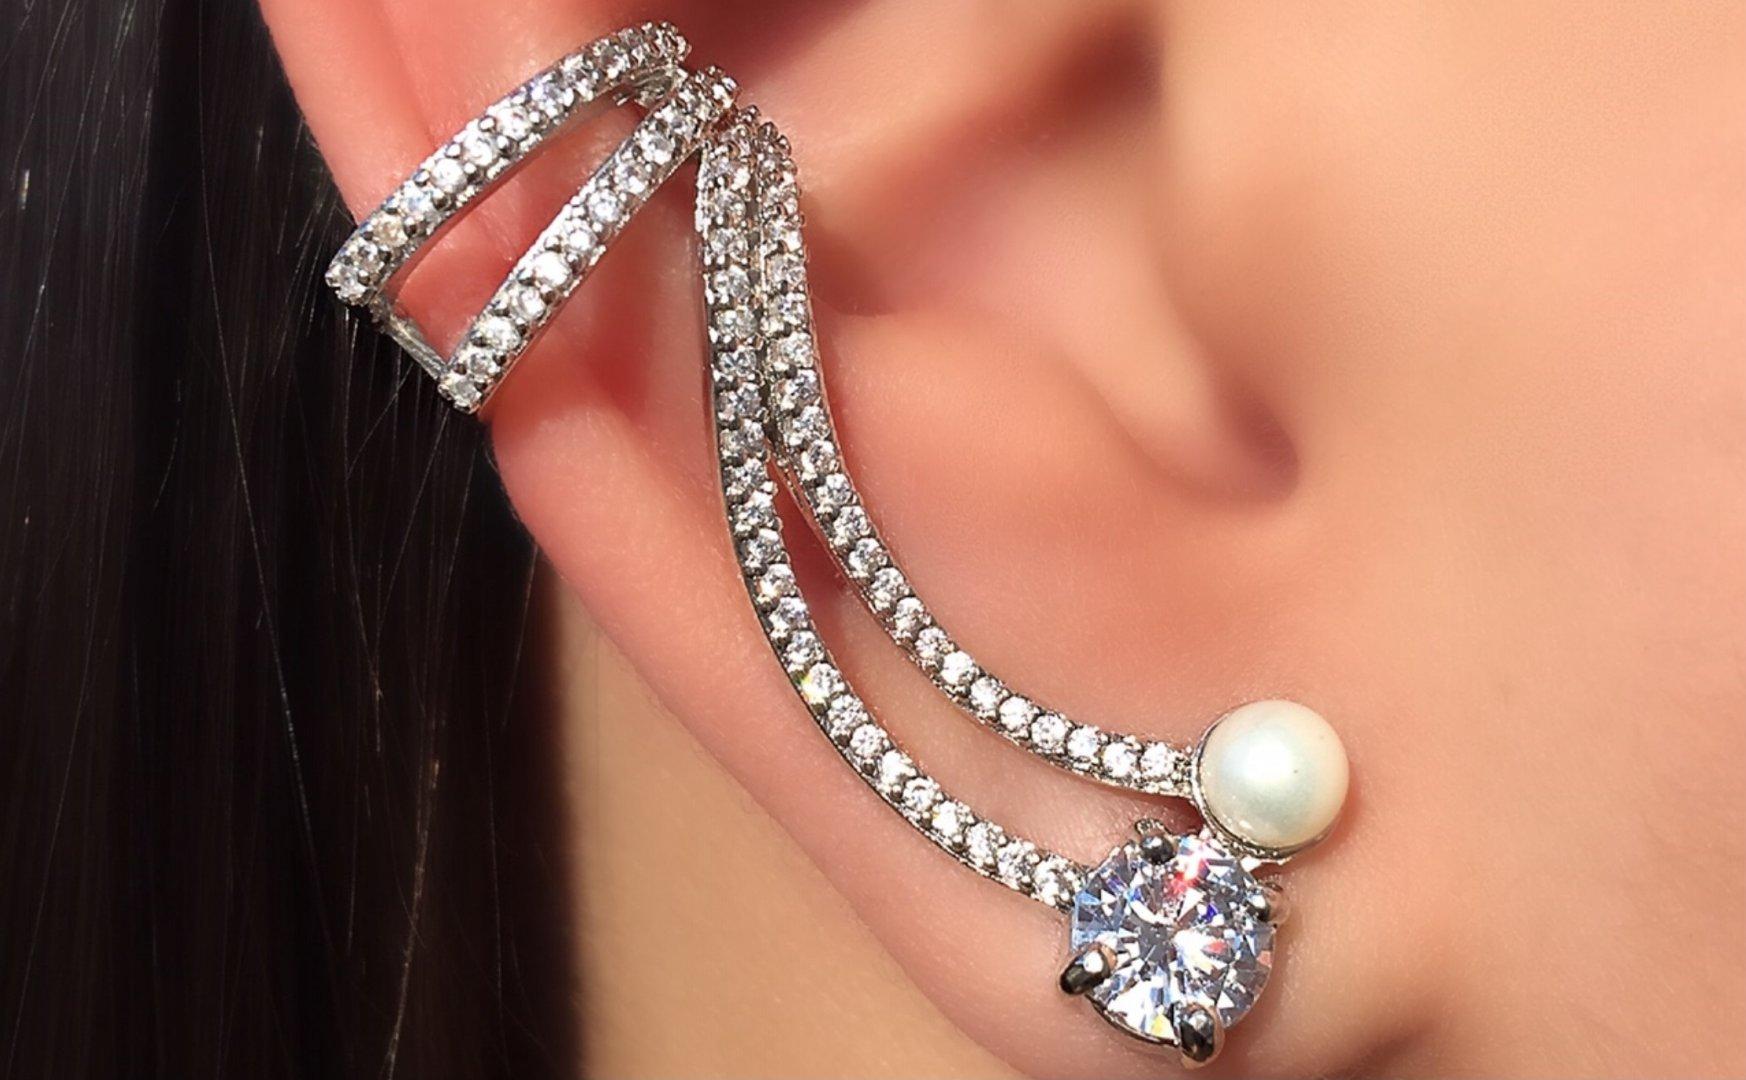 Dicas de como utilizar o brinco Ear cuff